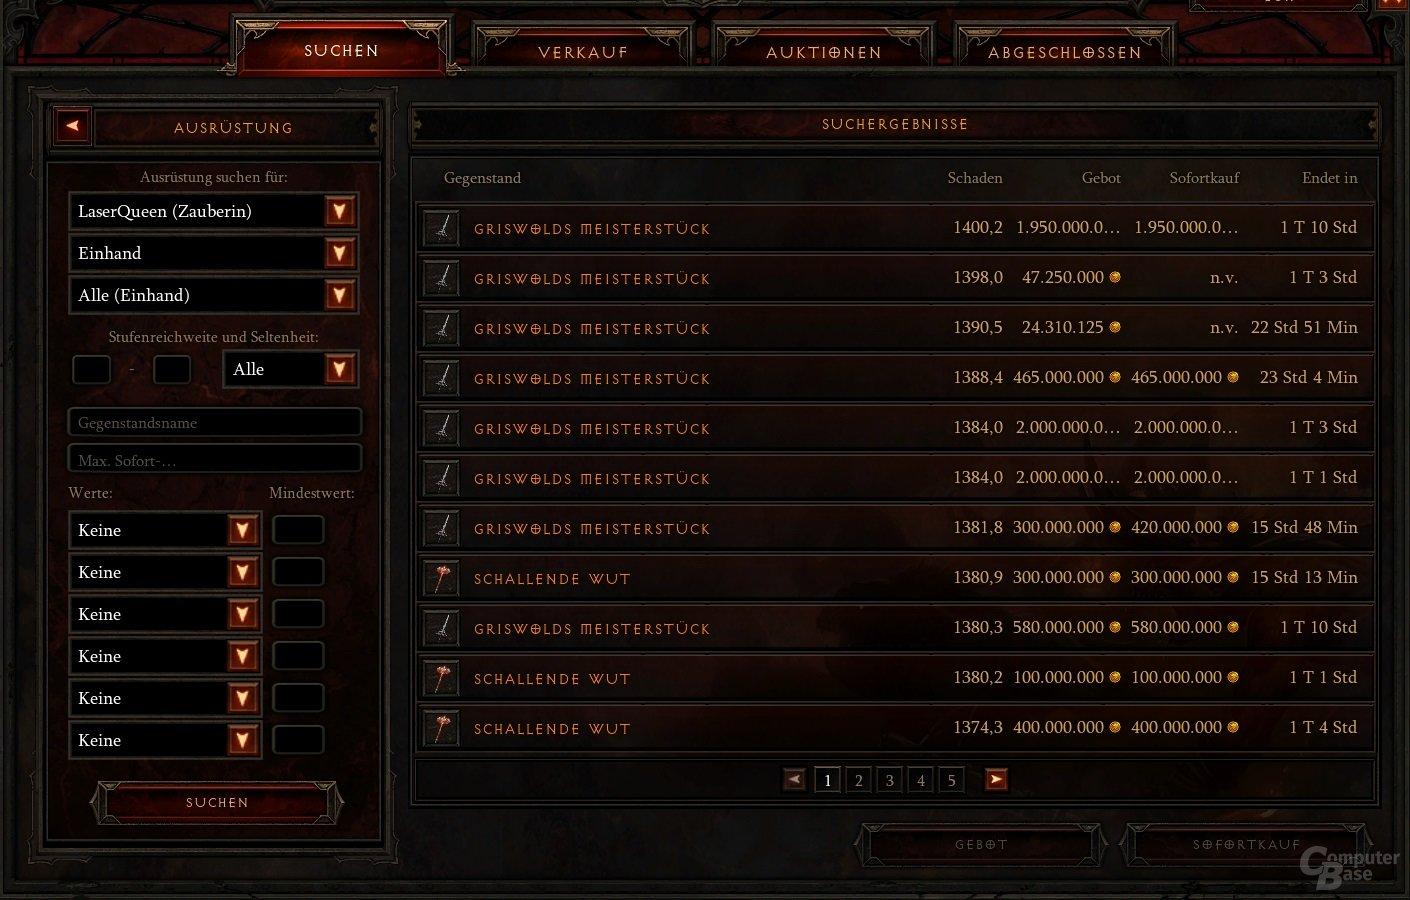 Auktionshaus in Diablo 3